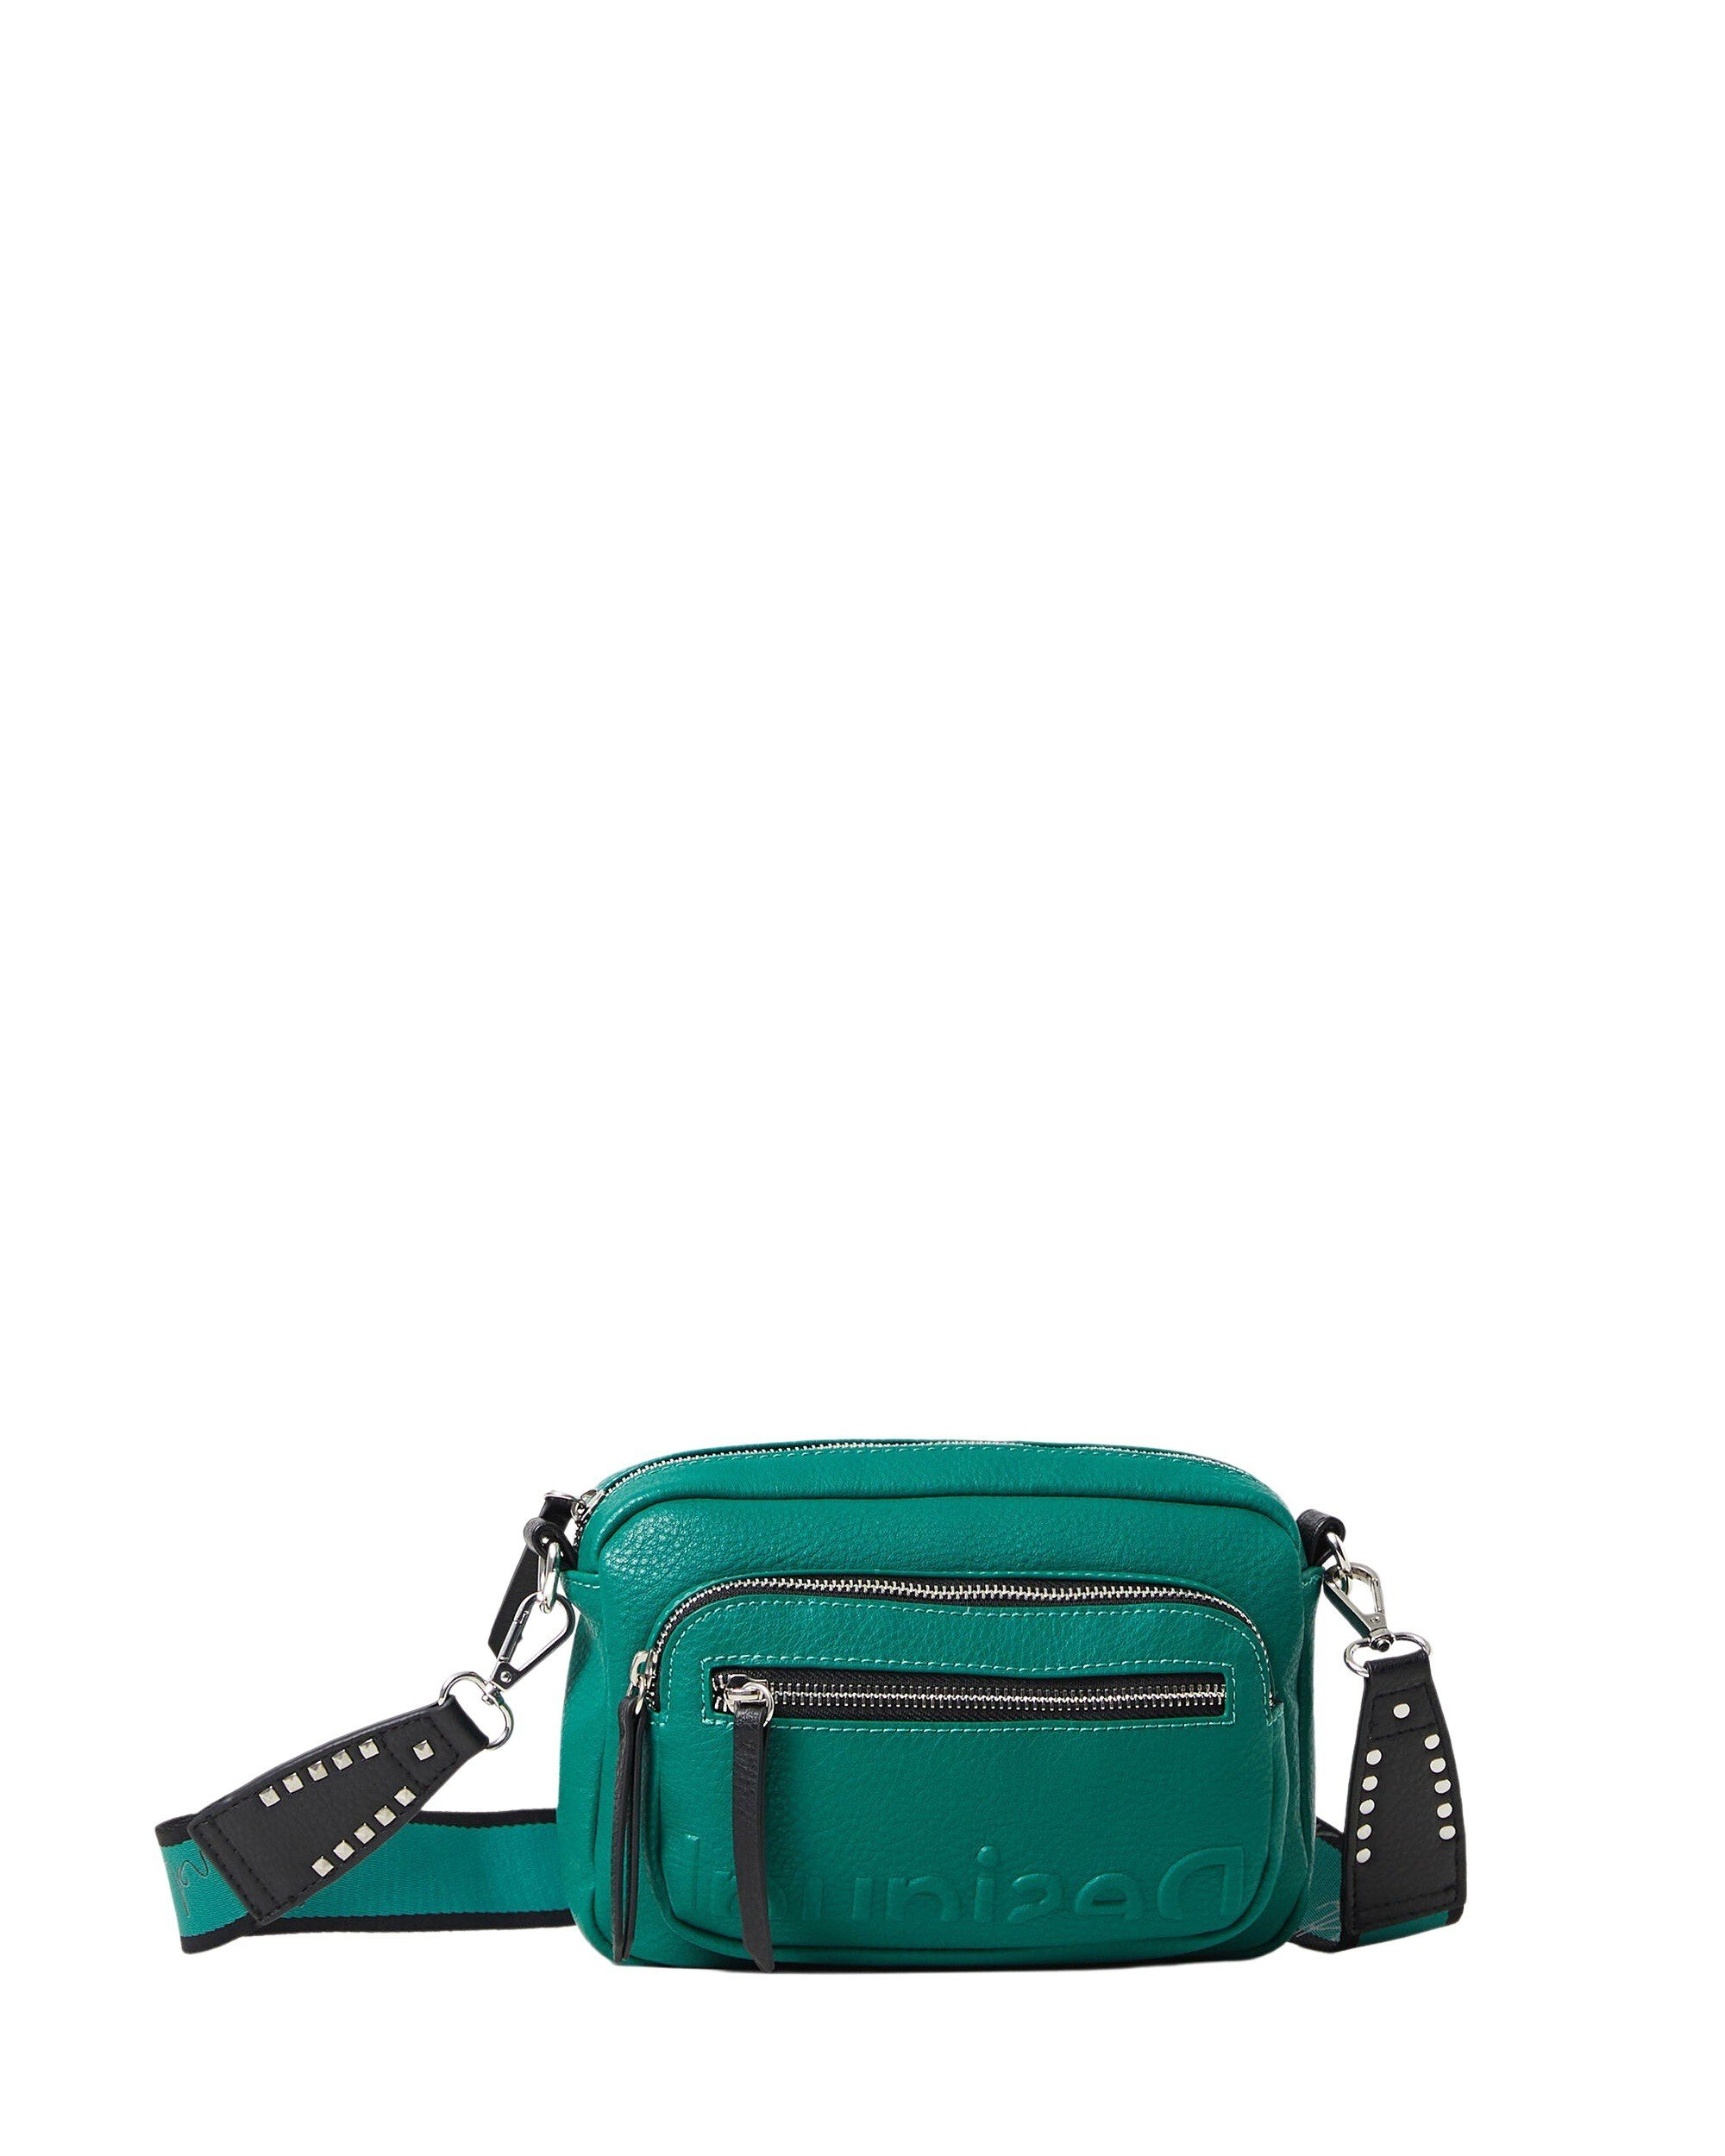 Desigual Women's Handbag Beige 305857 - green UNICA